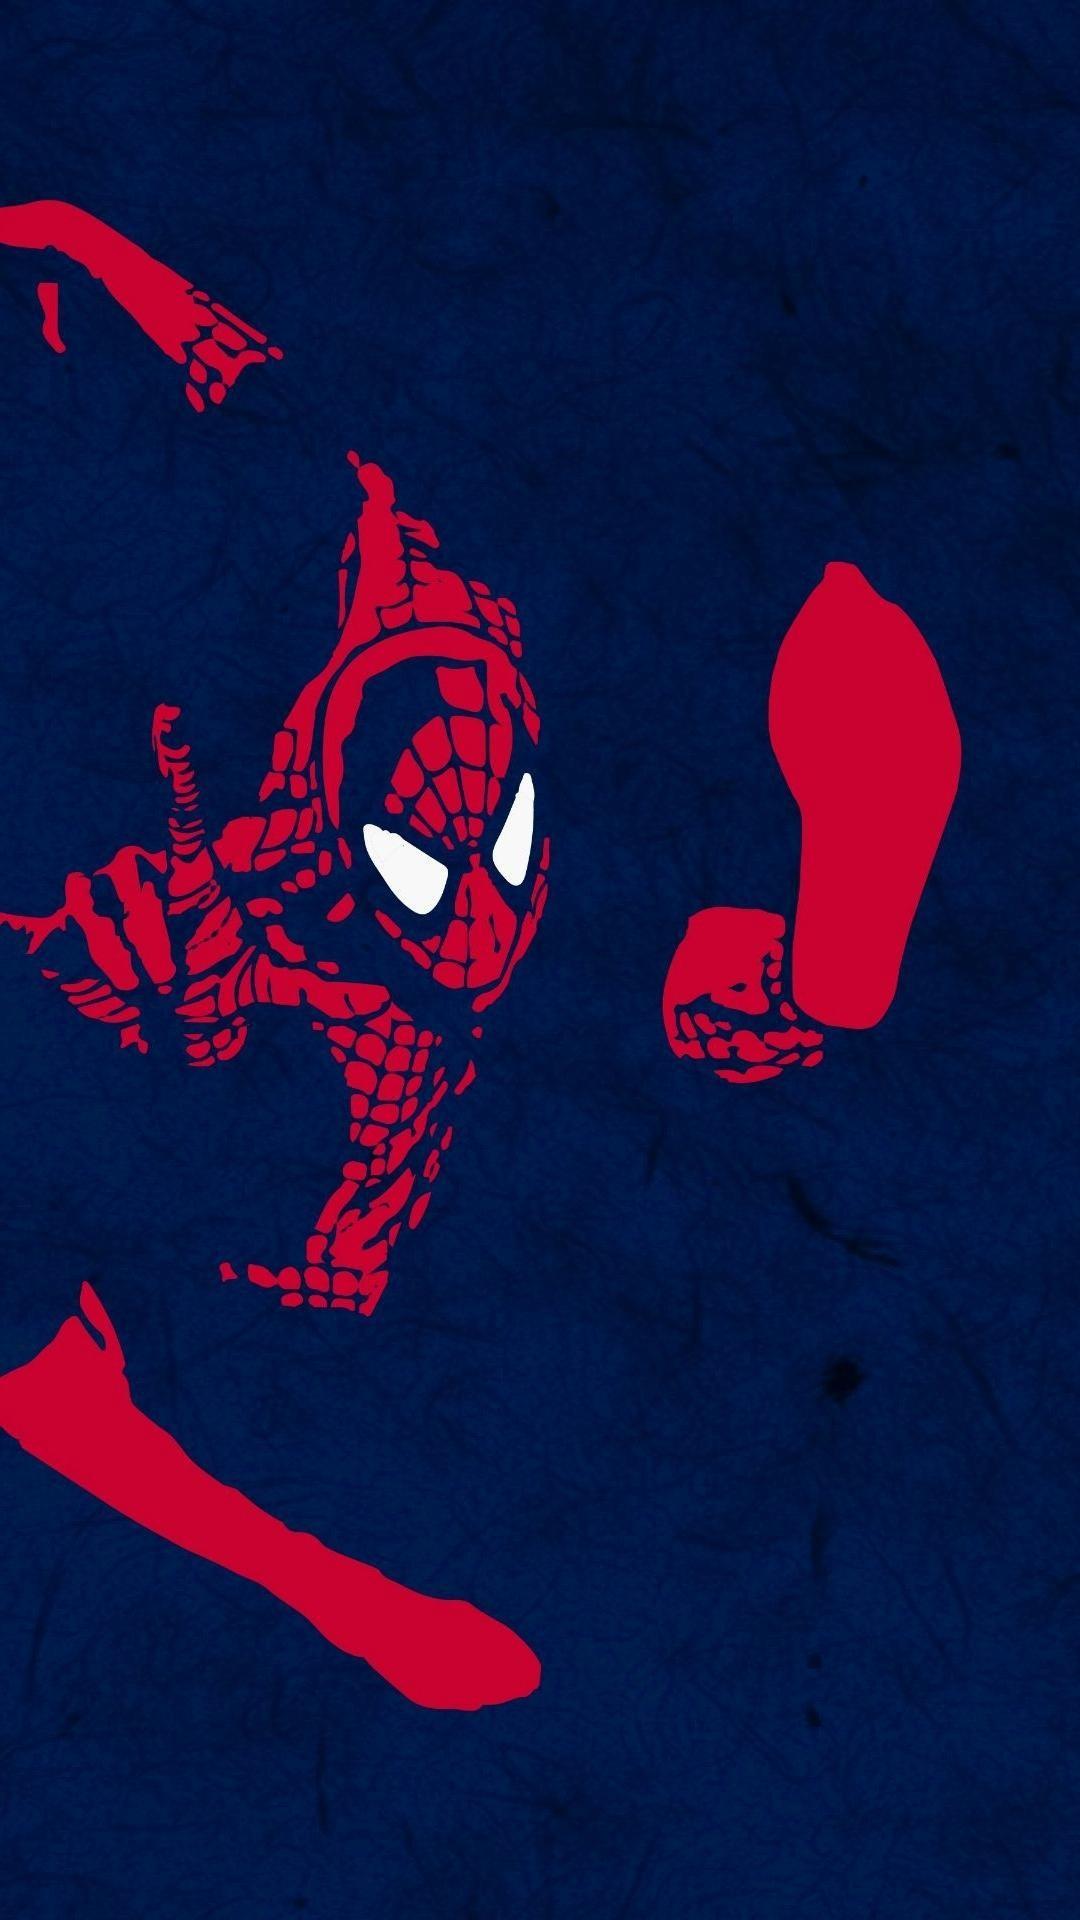 Spiderman backgrounds - Spiderman iphone x wallpaper ...